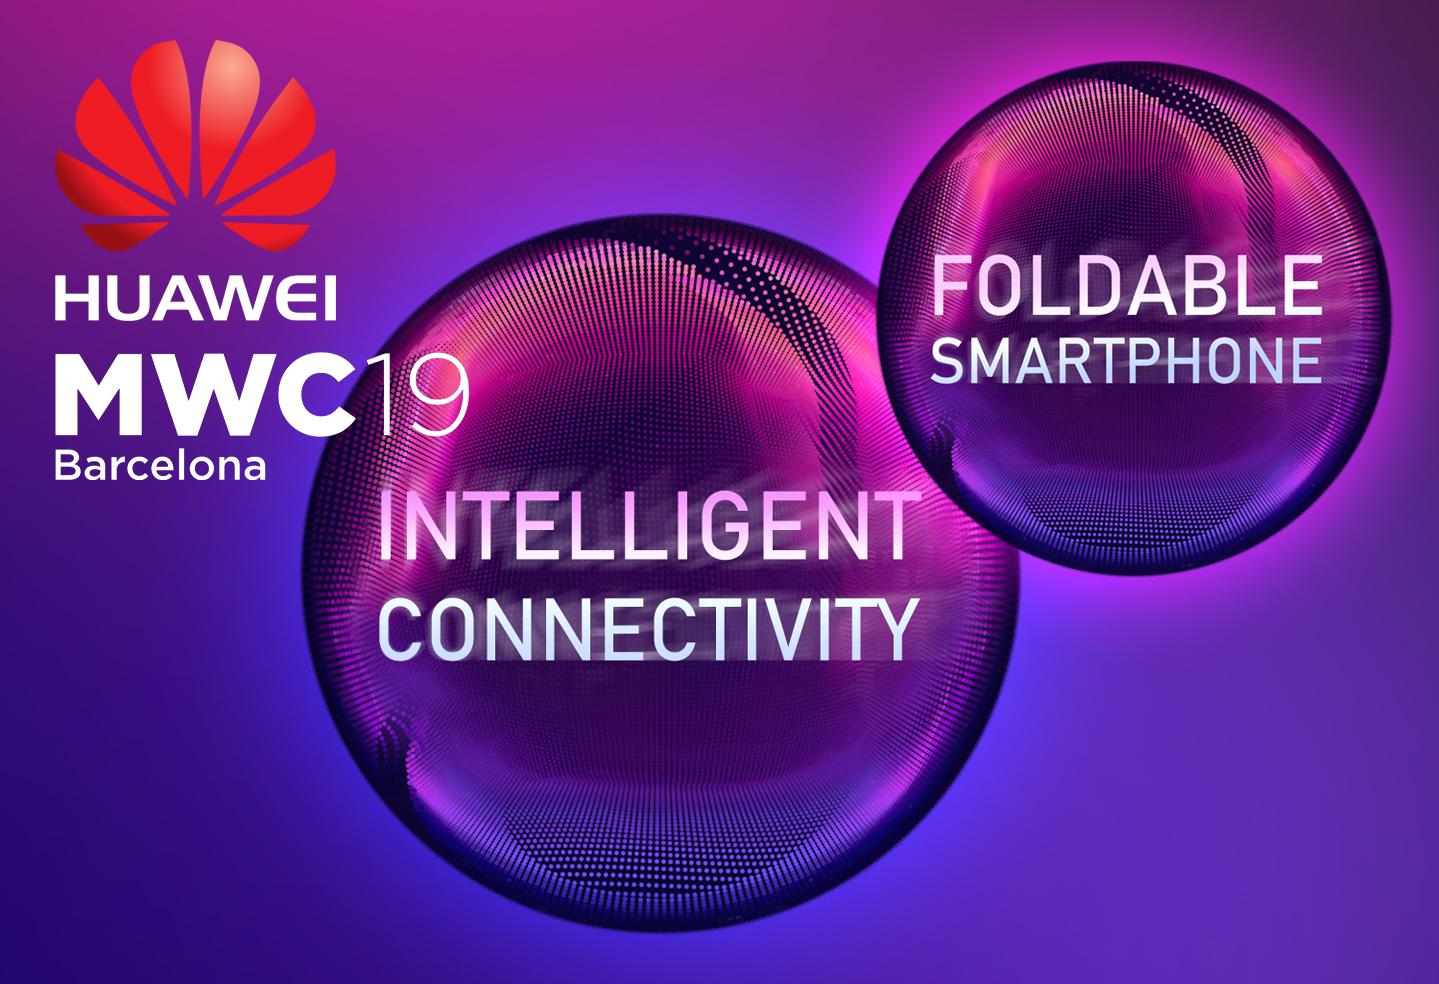 Huawei smartphones MWC 2019